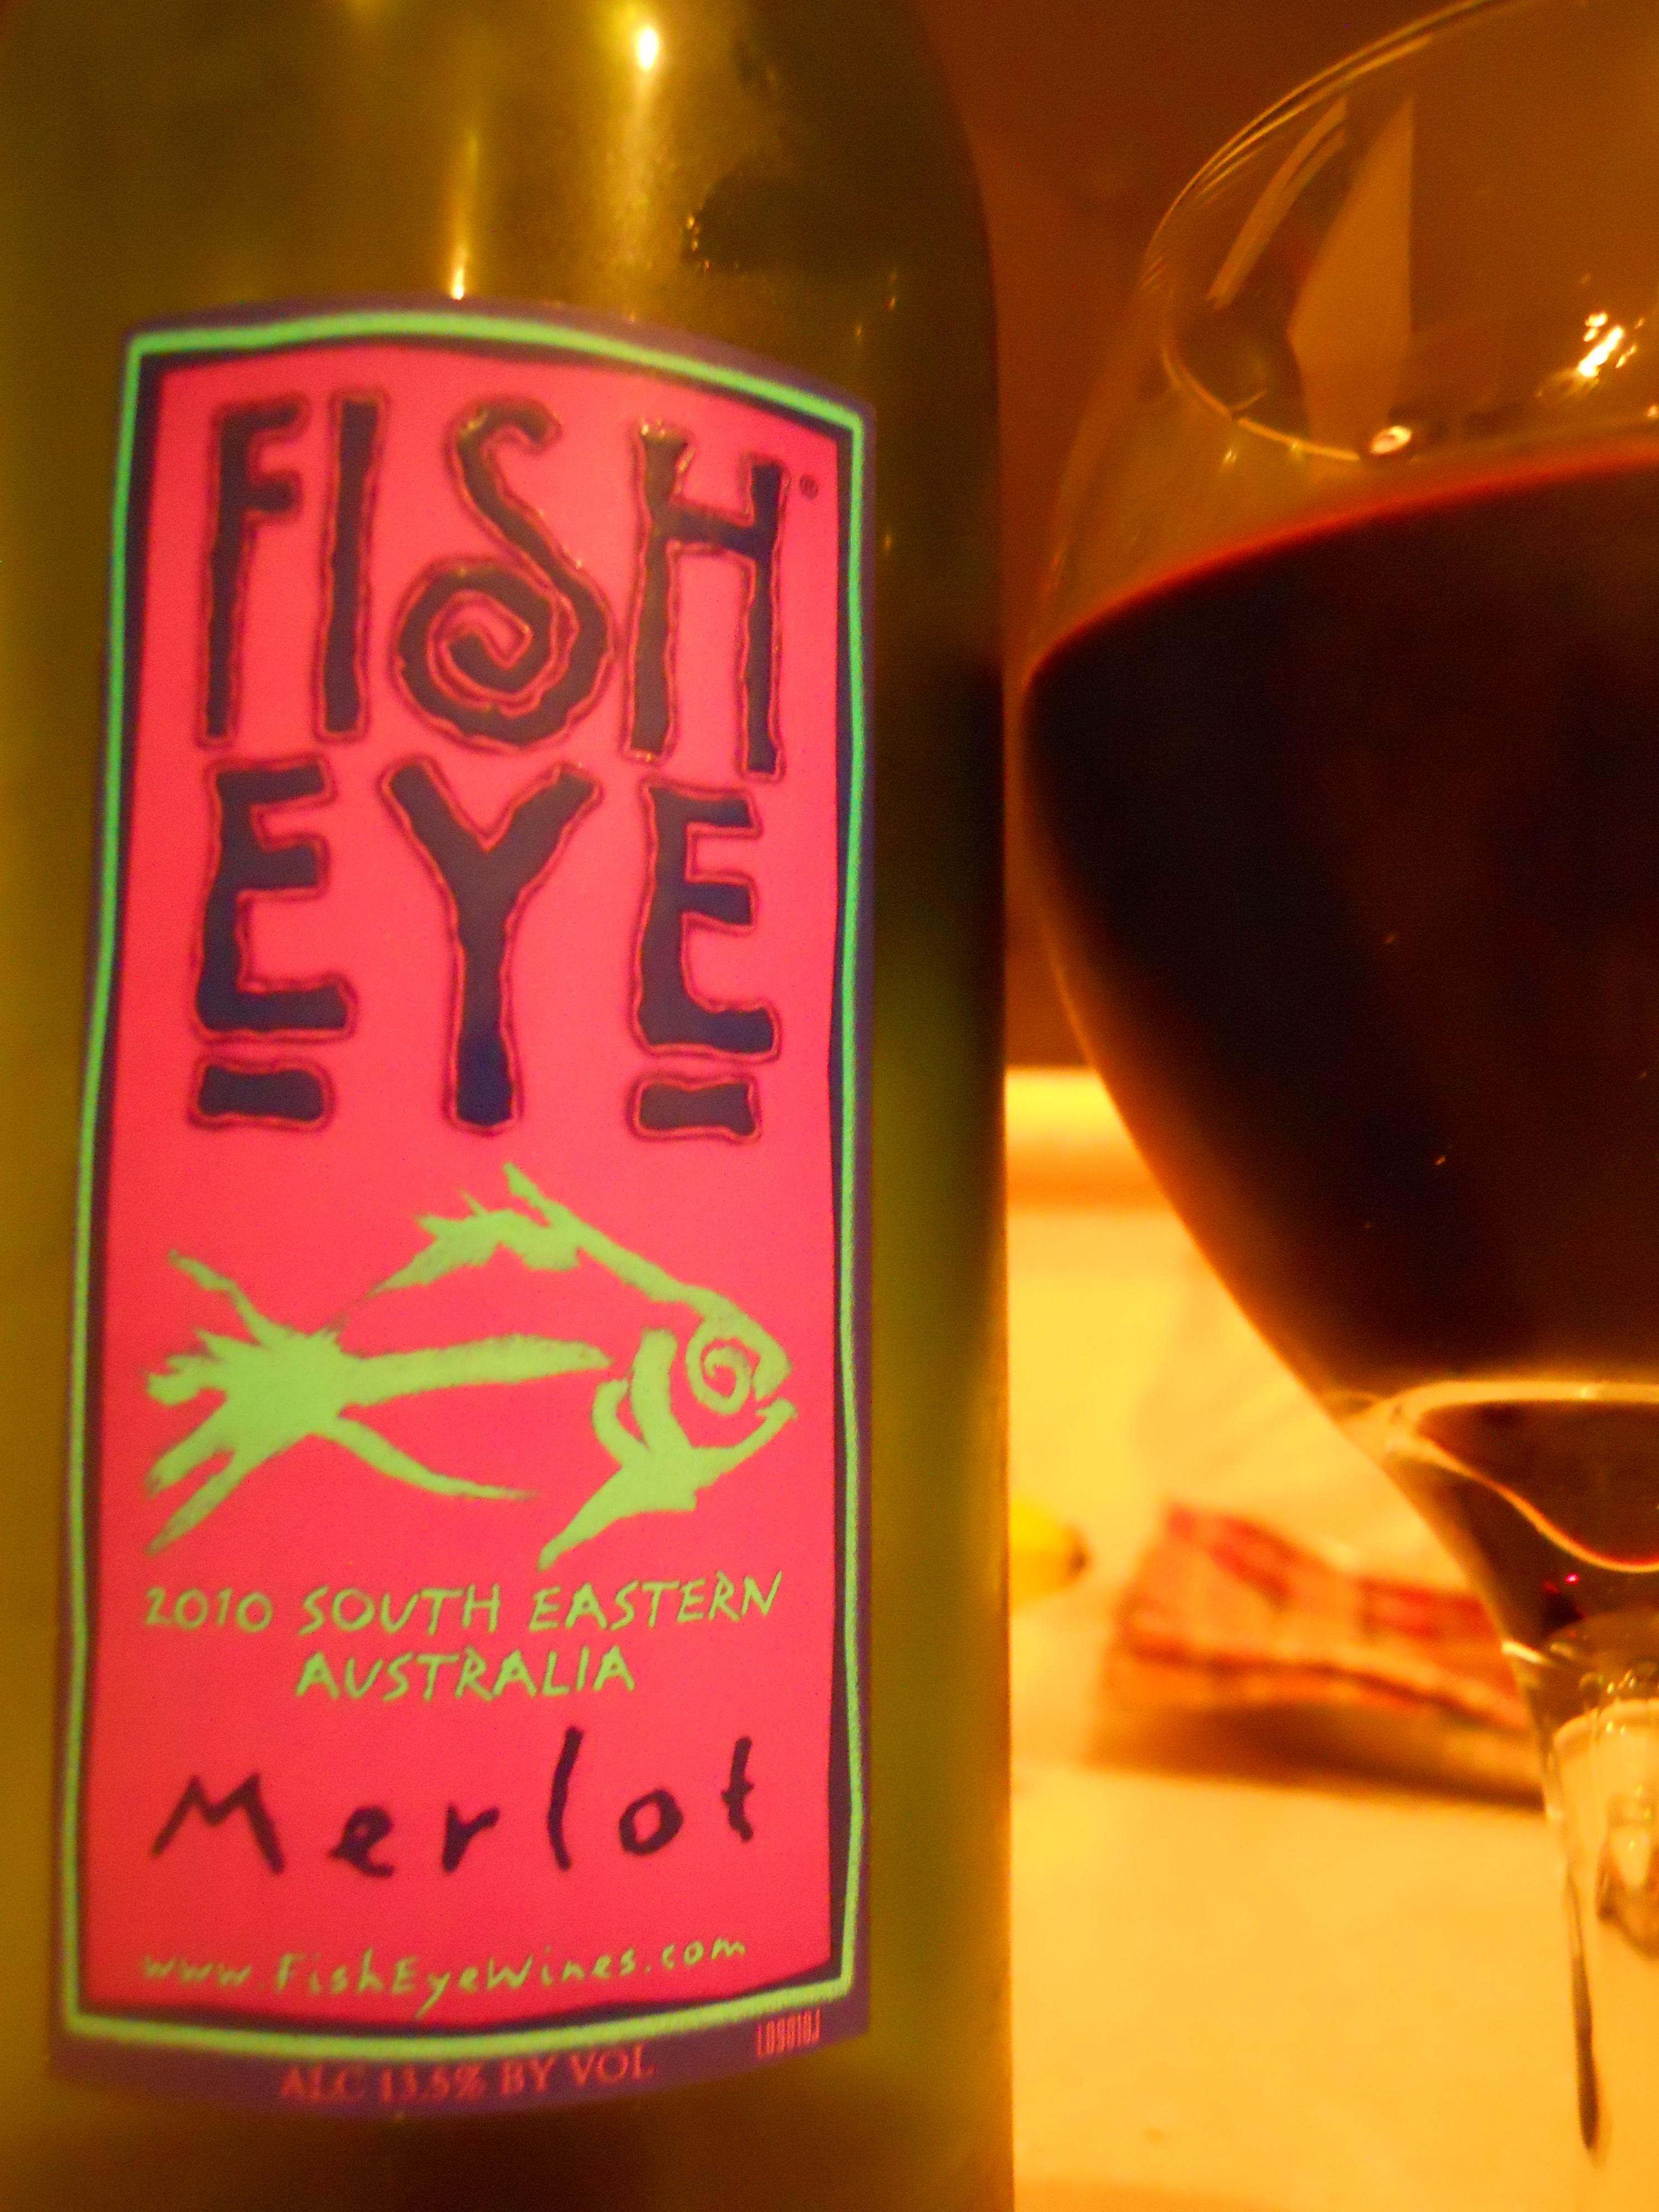 Fish eye merlot 2010 south eastern australia wine and for Fish eye wine